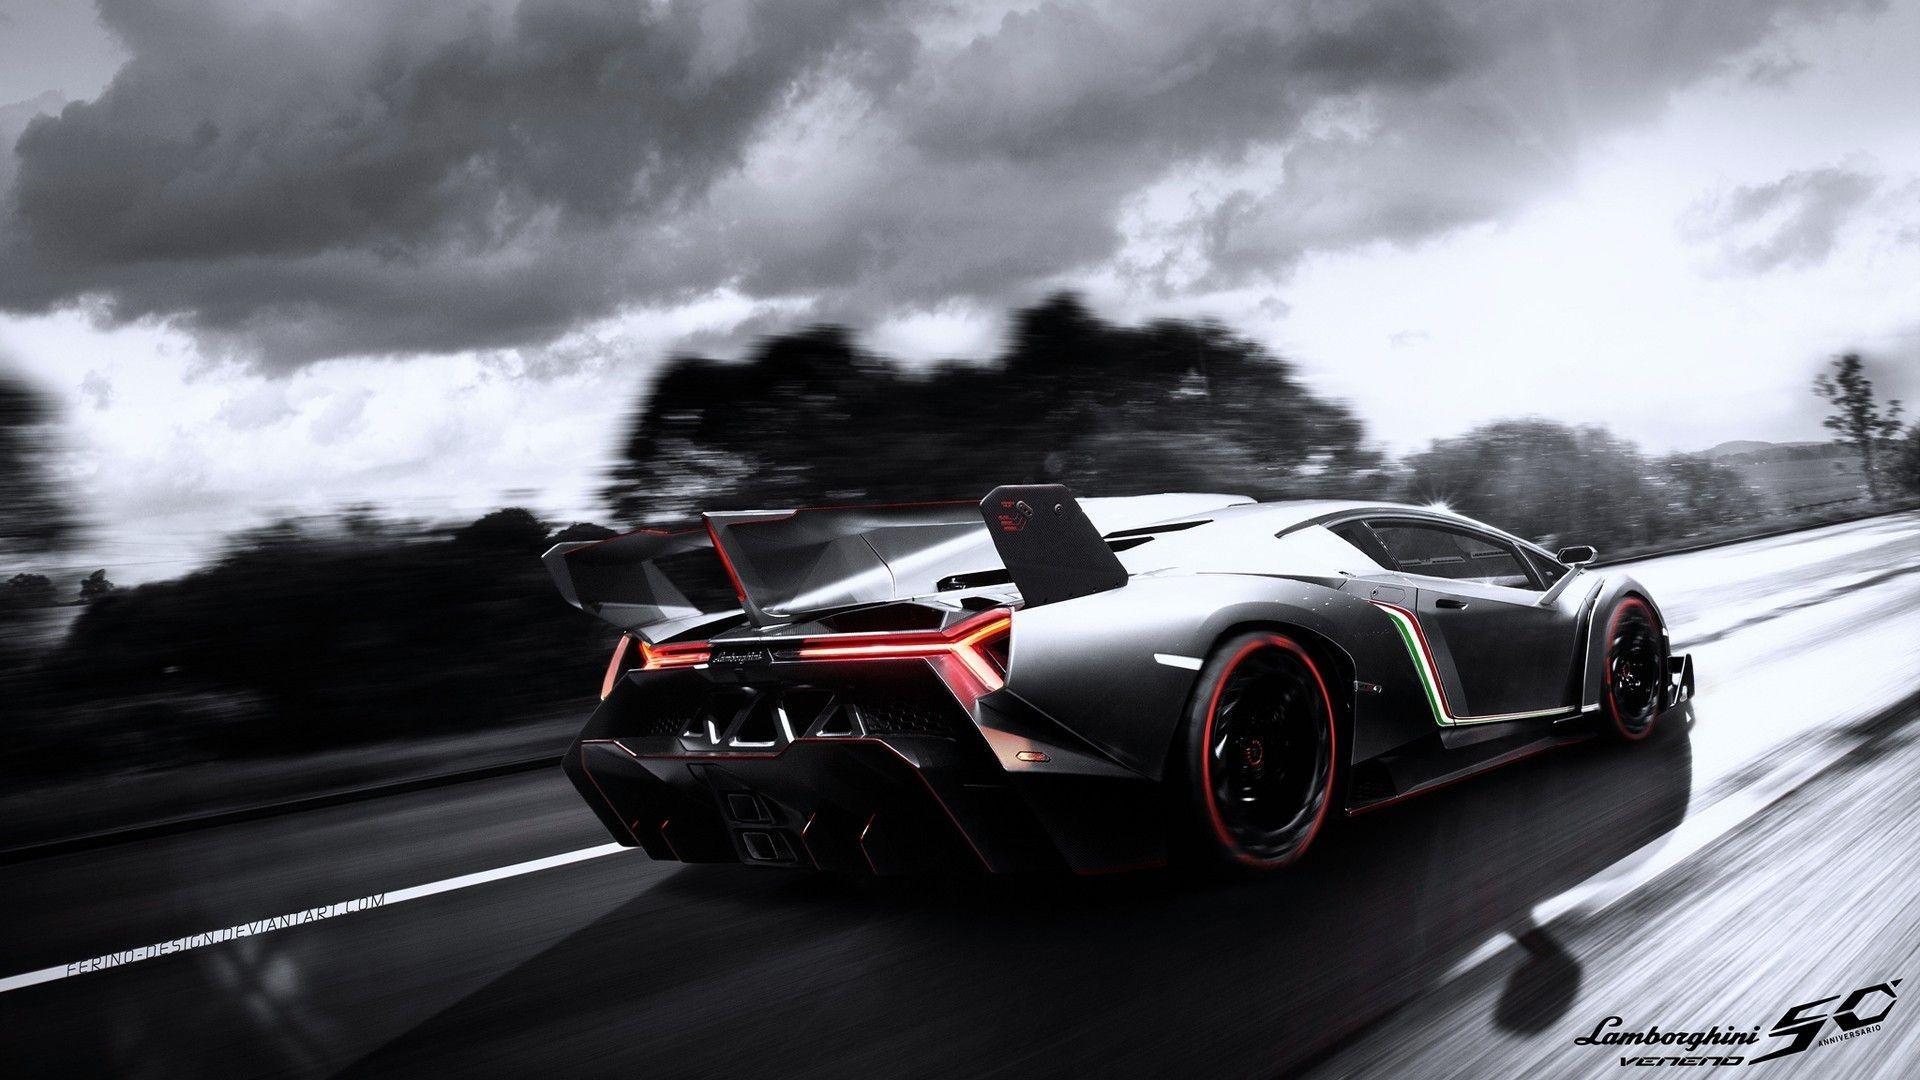 Lamborghini HTC Wallpapers